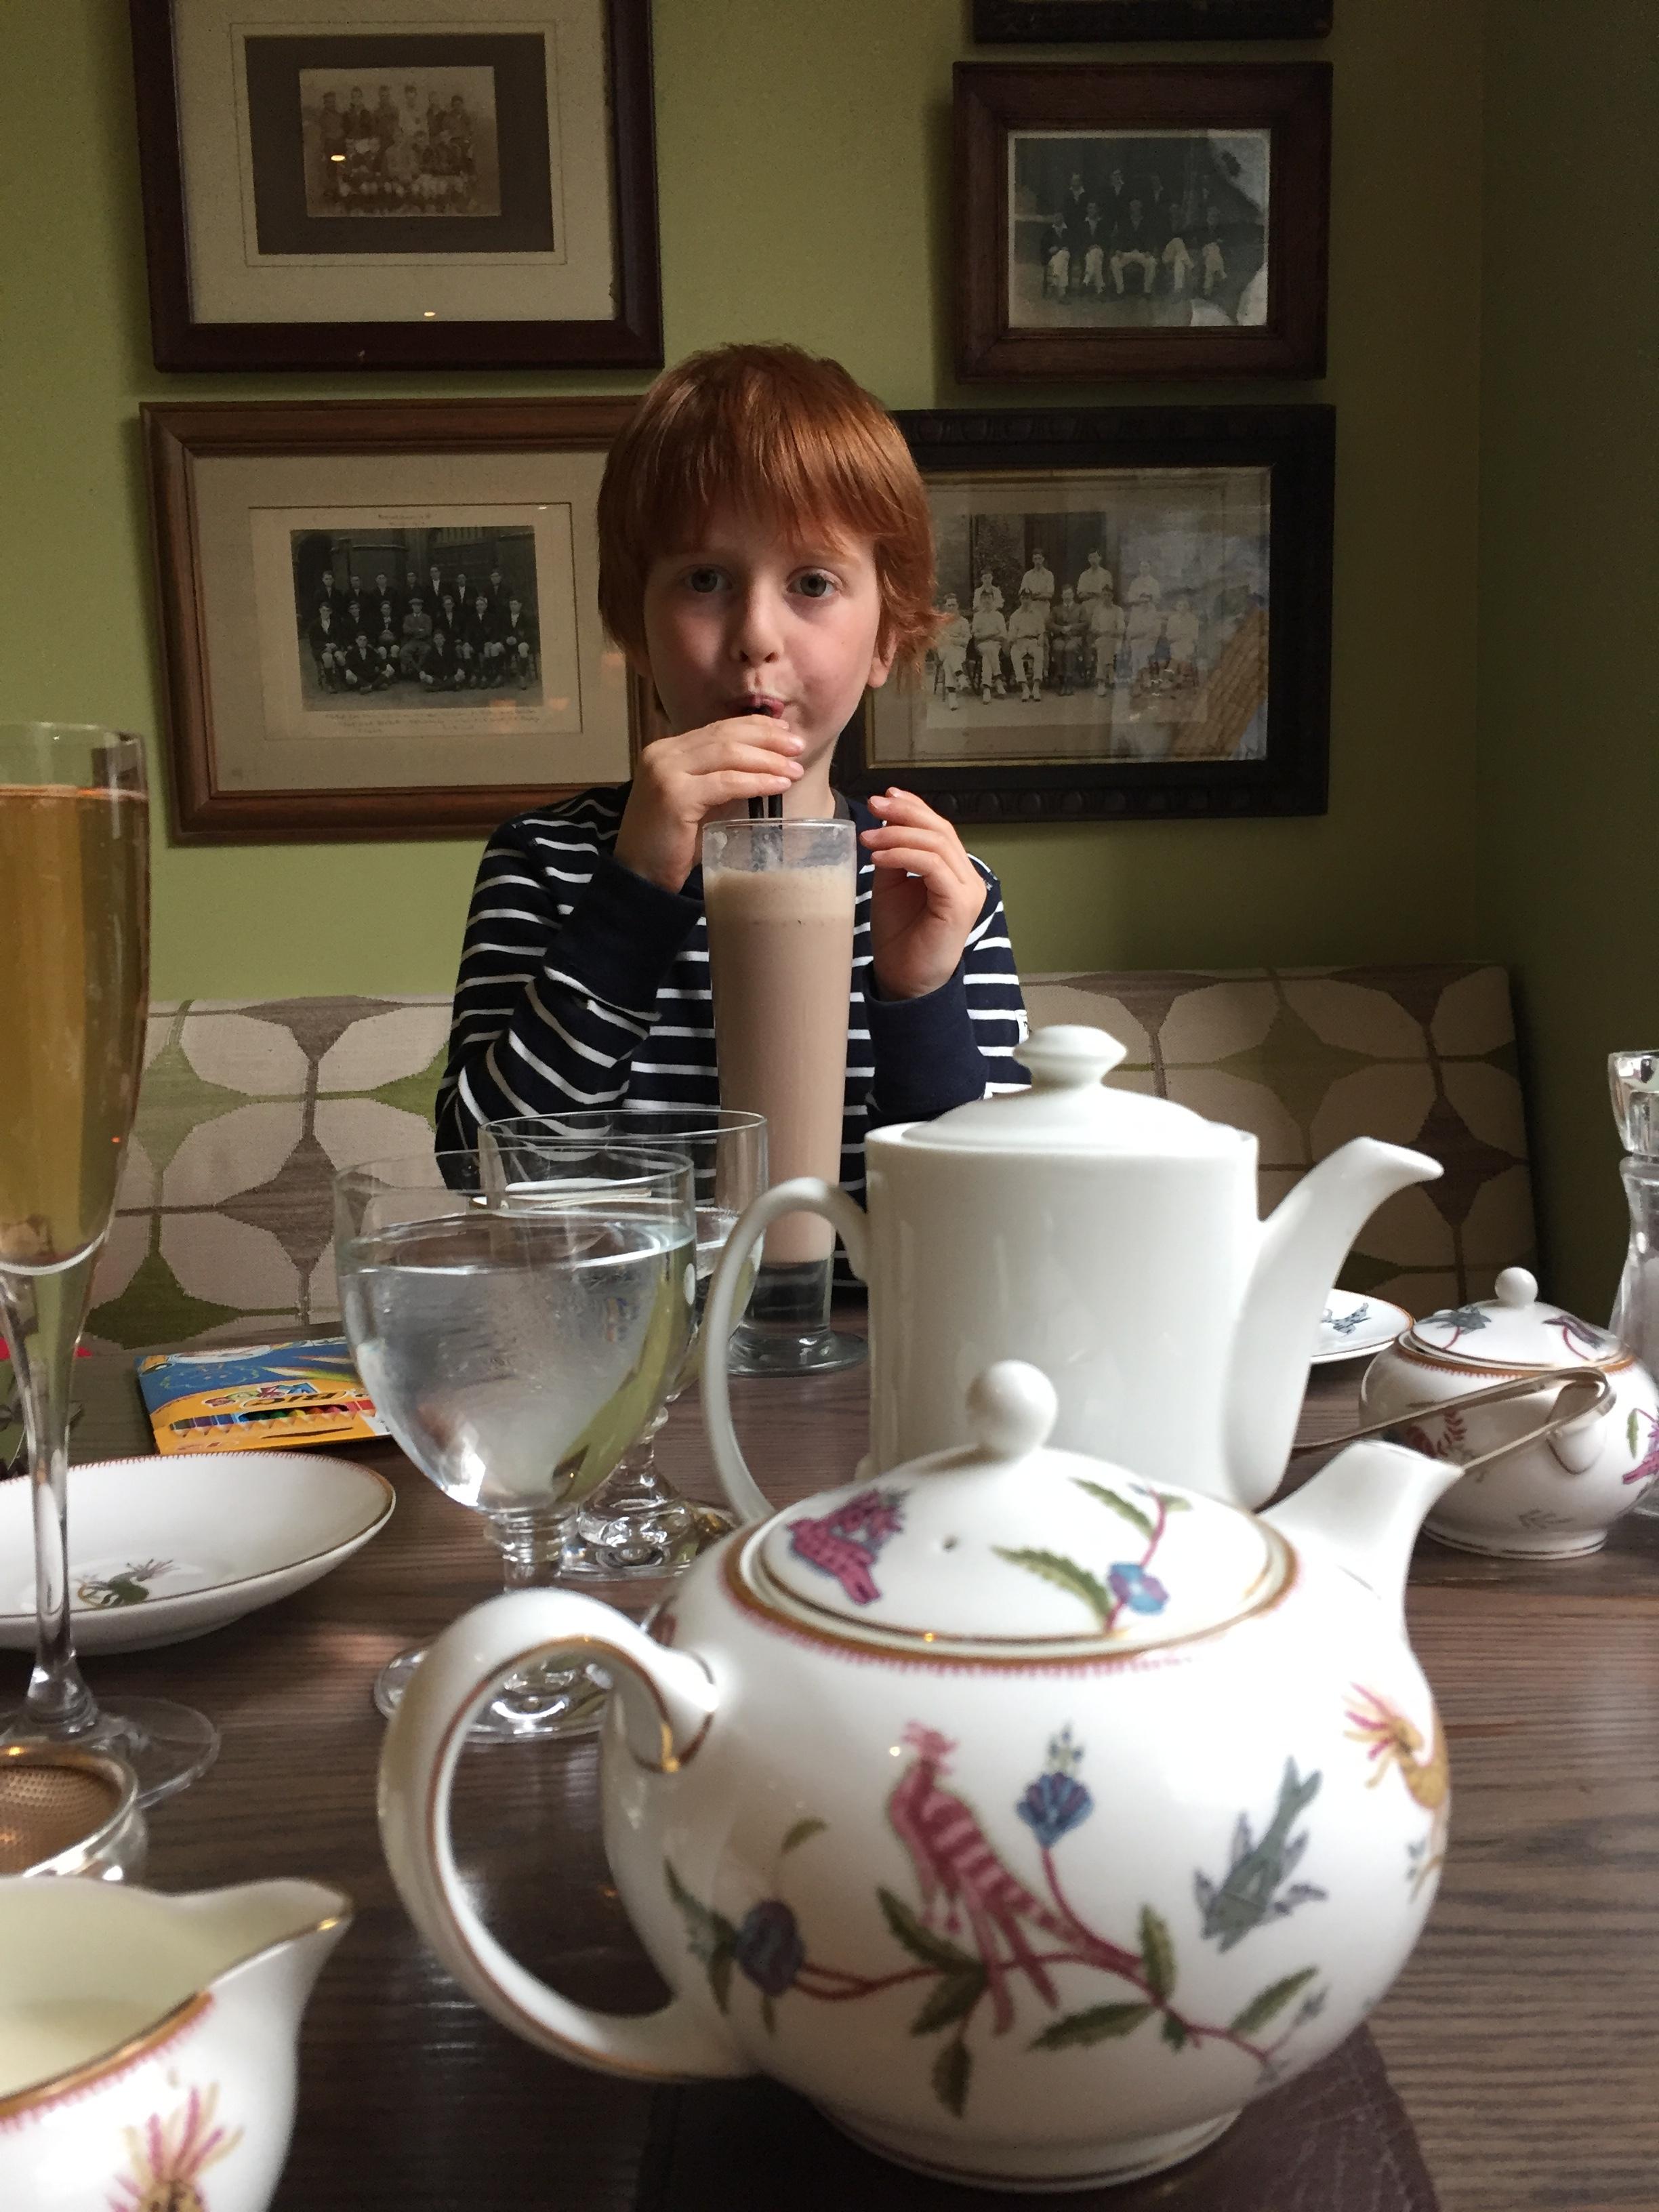 Oscar and the Giant Milkshake